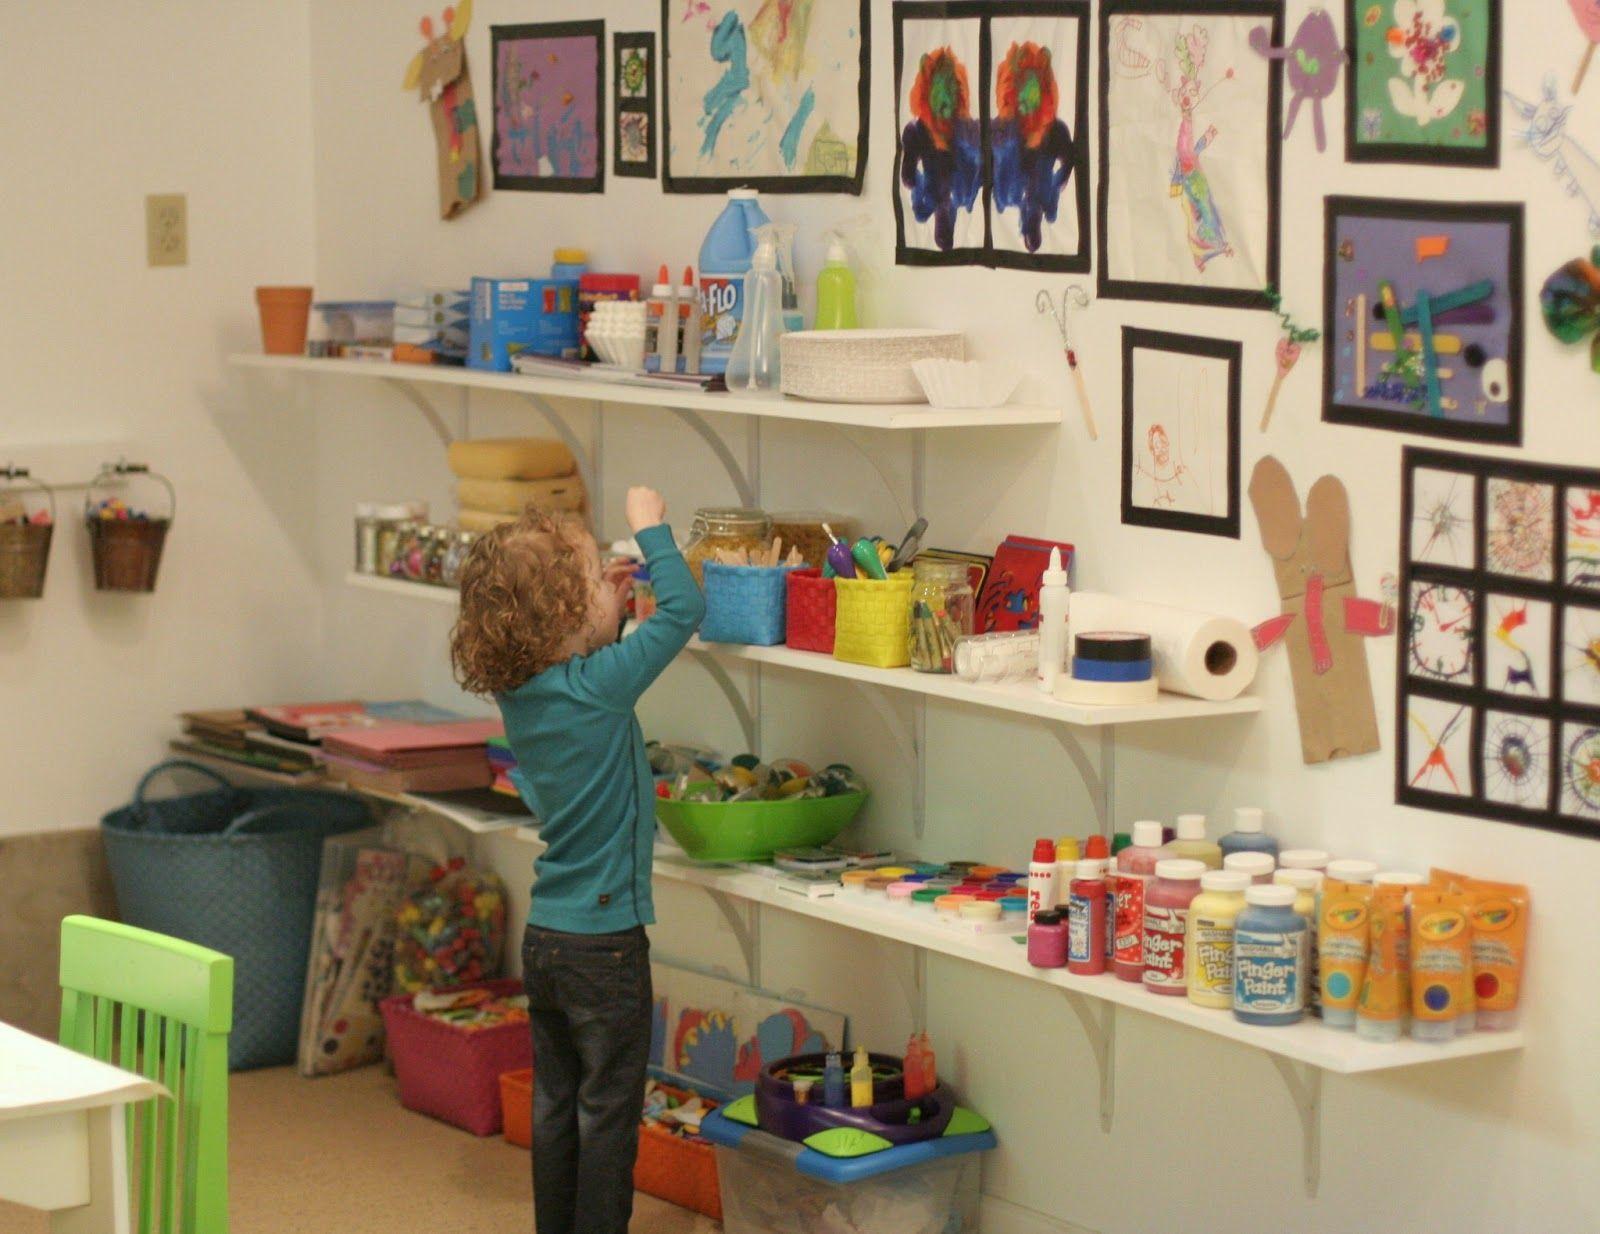 Playroom Design Playroom Design Our Art Room  Playroom Design Playrooms And Room